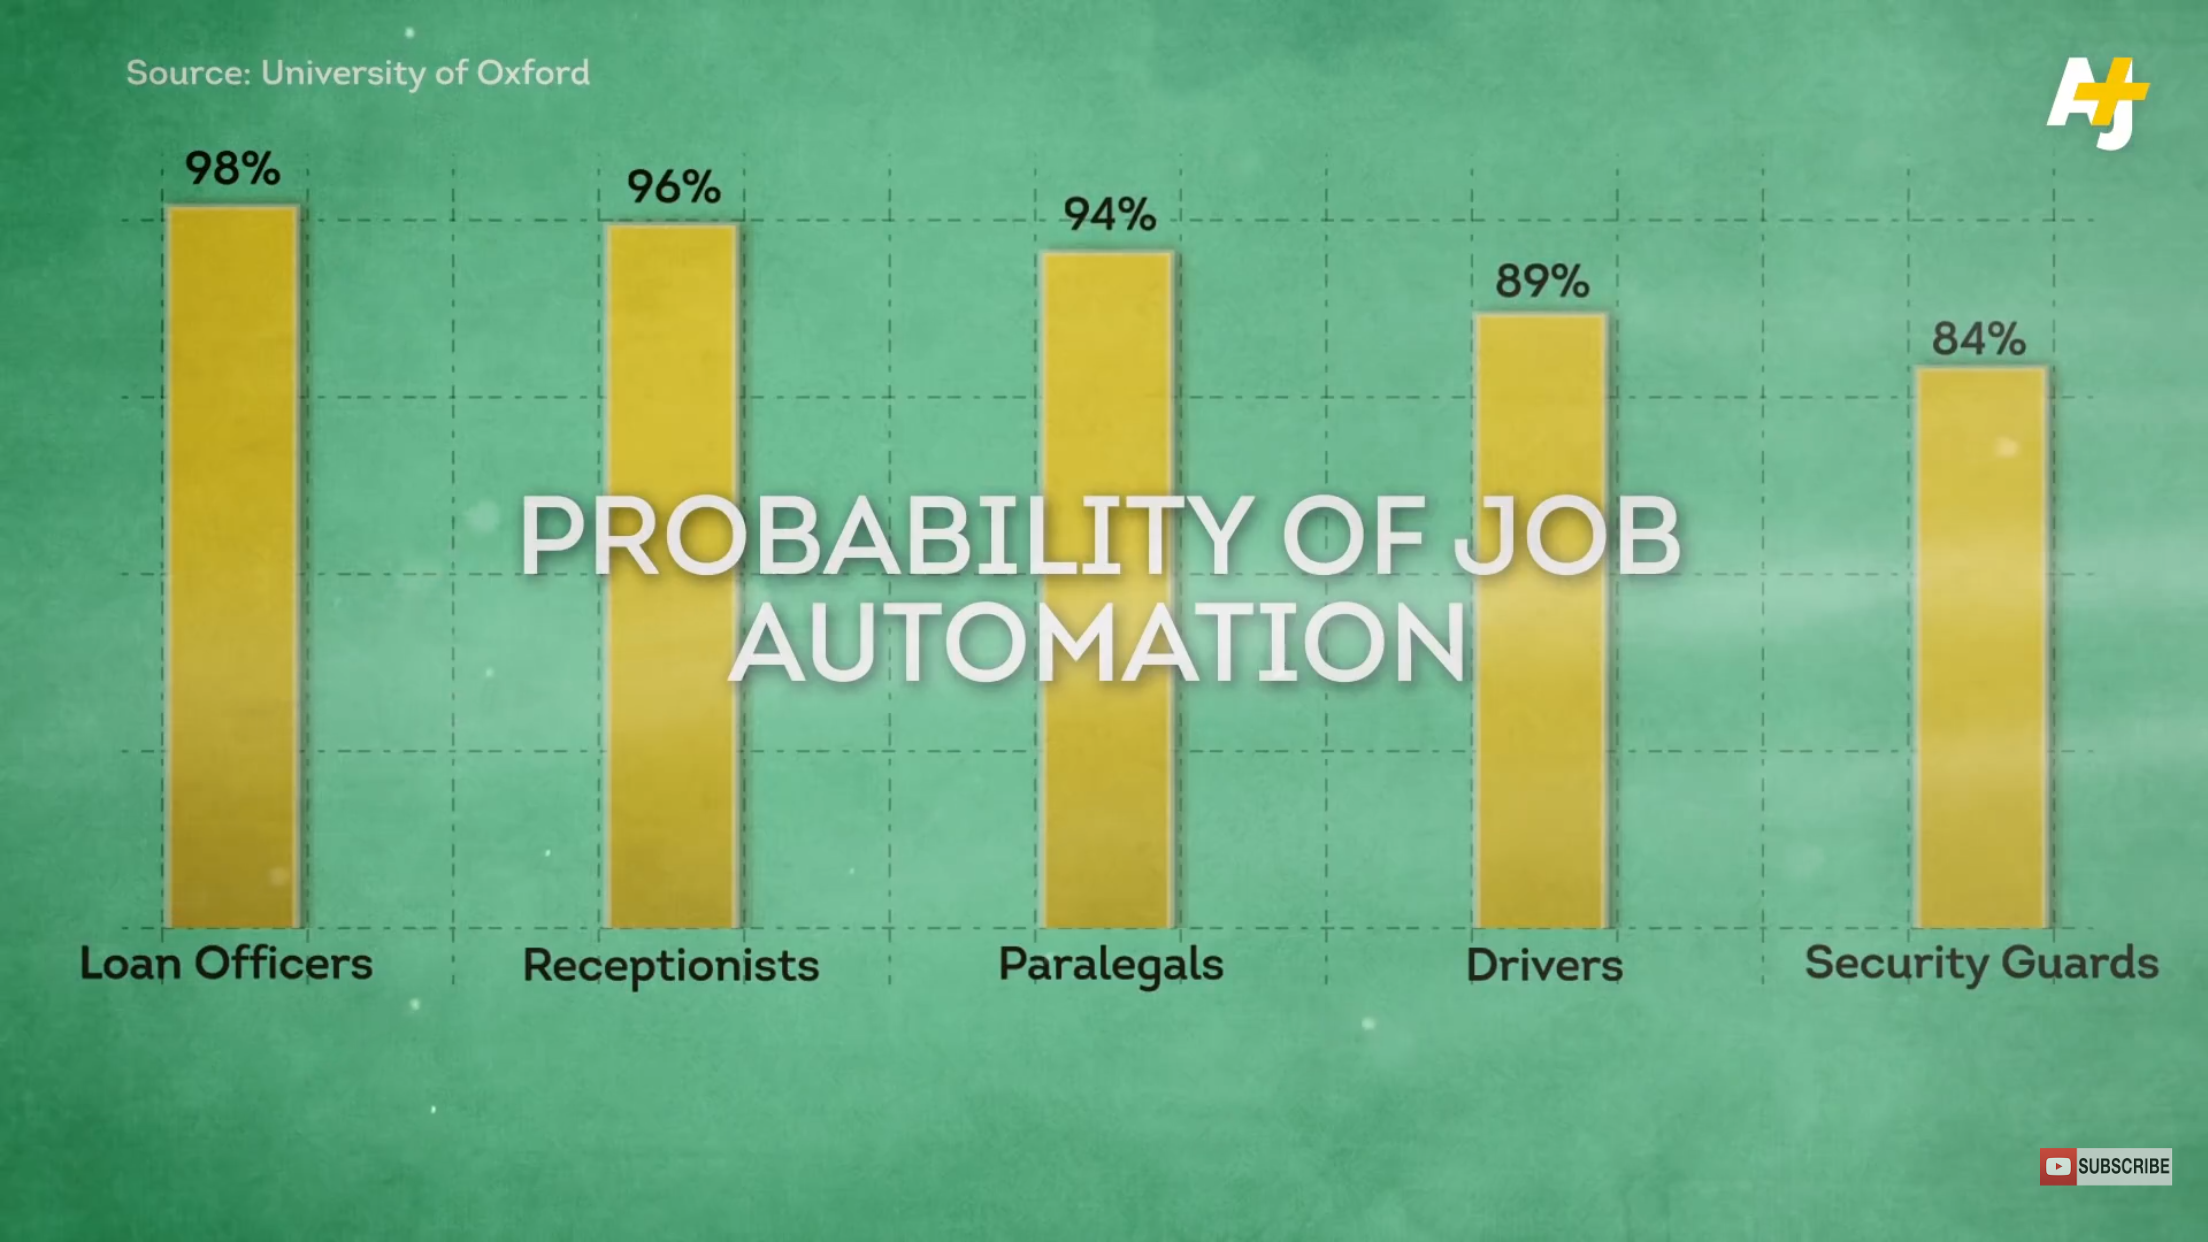 Likelihood of specific job becoming automated